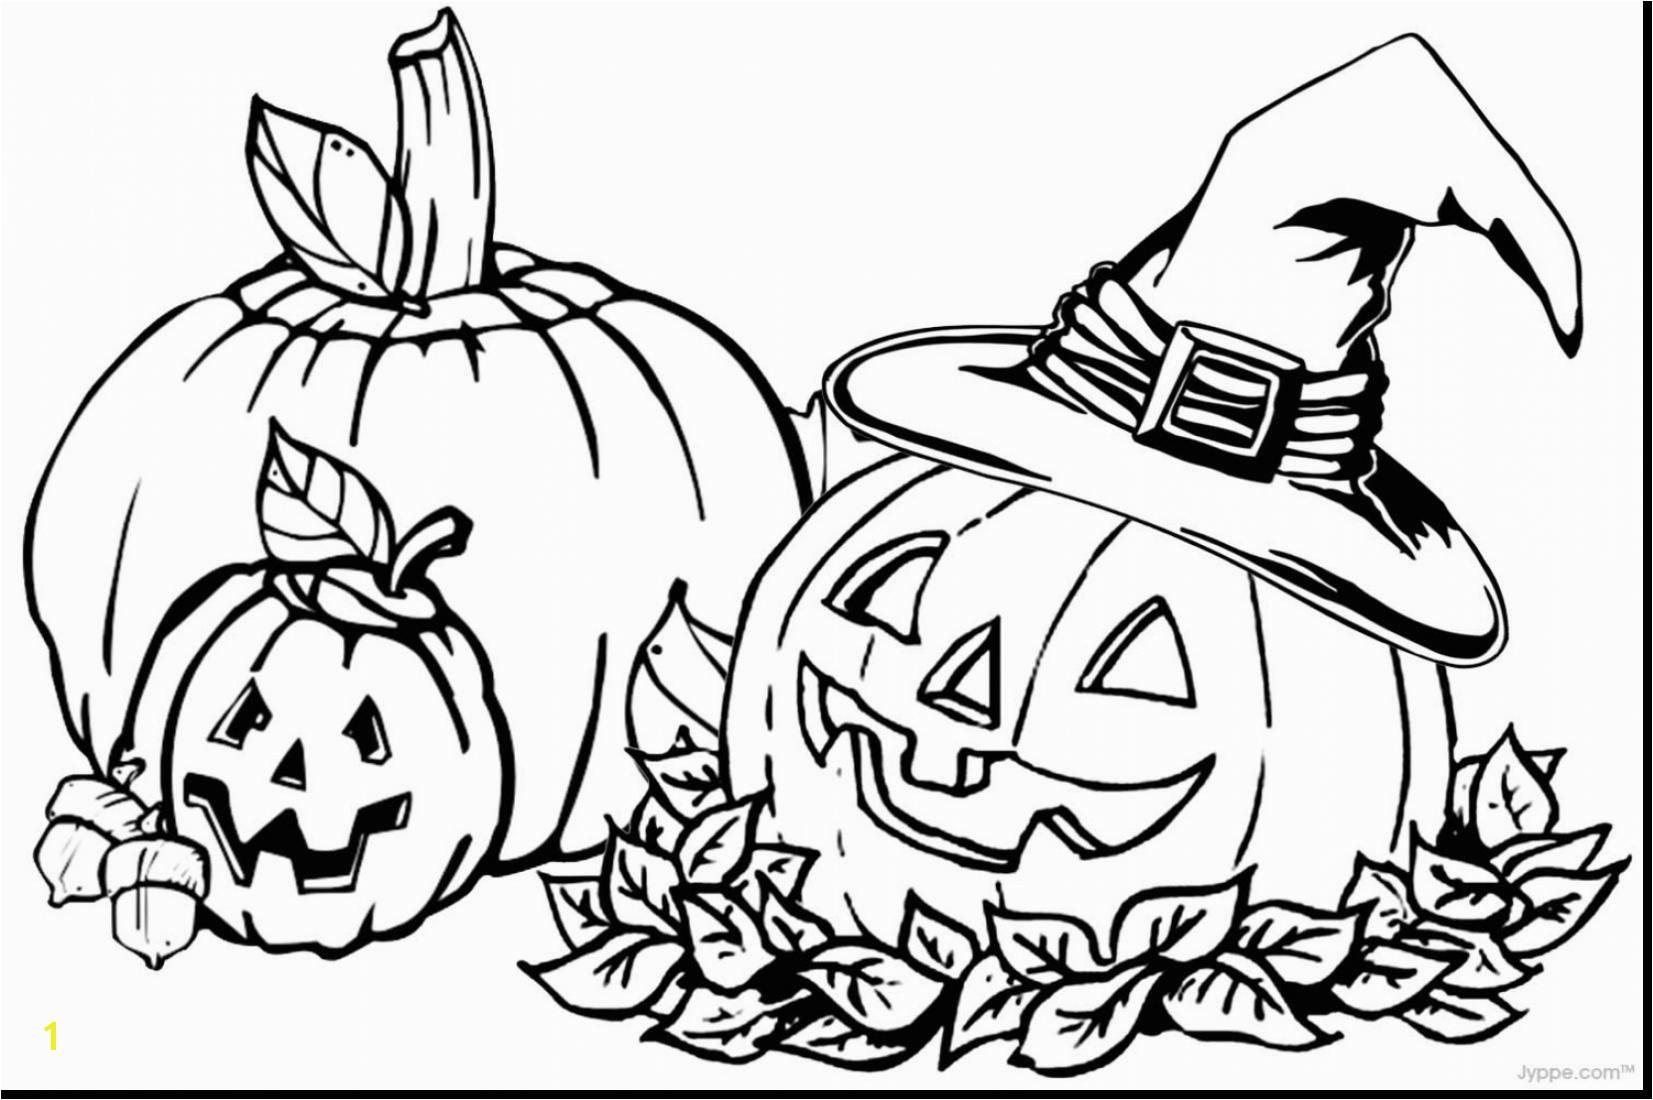 Happy Halloween Pumpkin Coloring Pages Best Luxury Pumpkin Coloring Pages to Print 20 Elegant